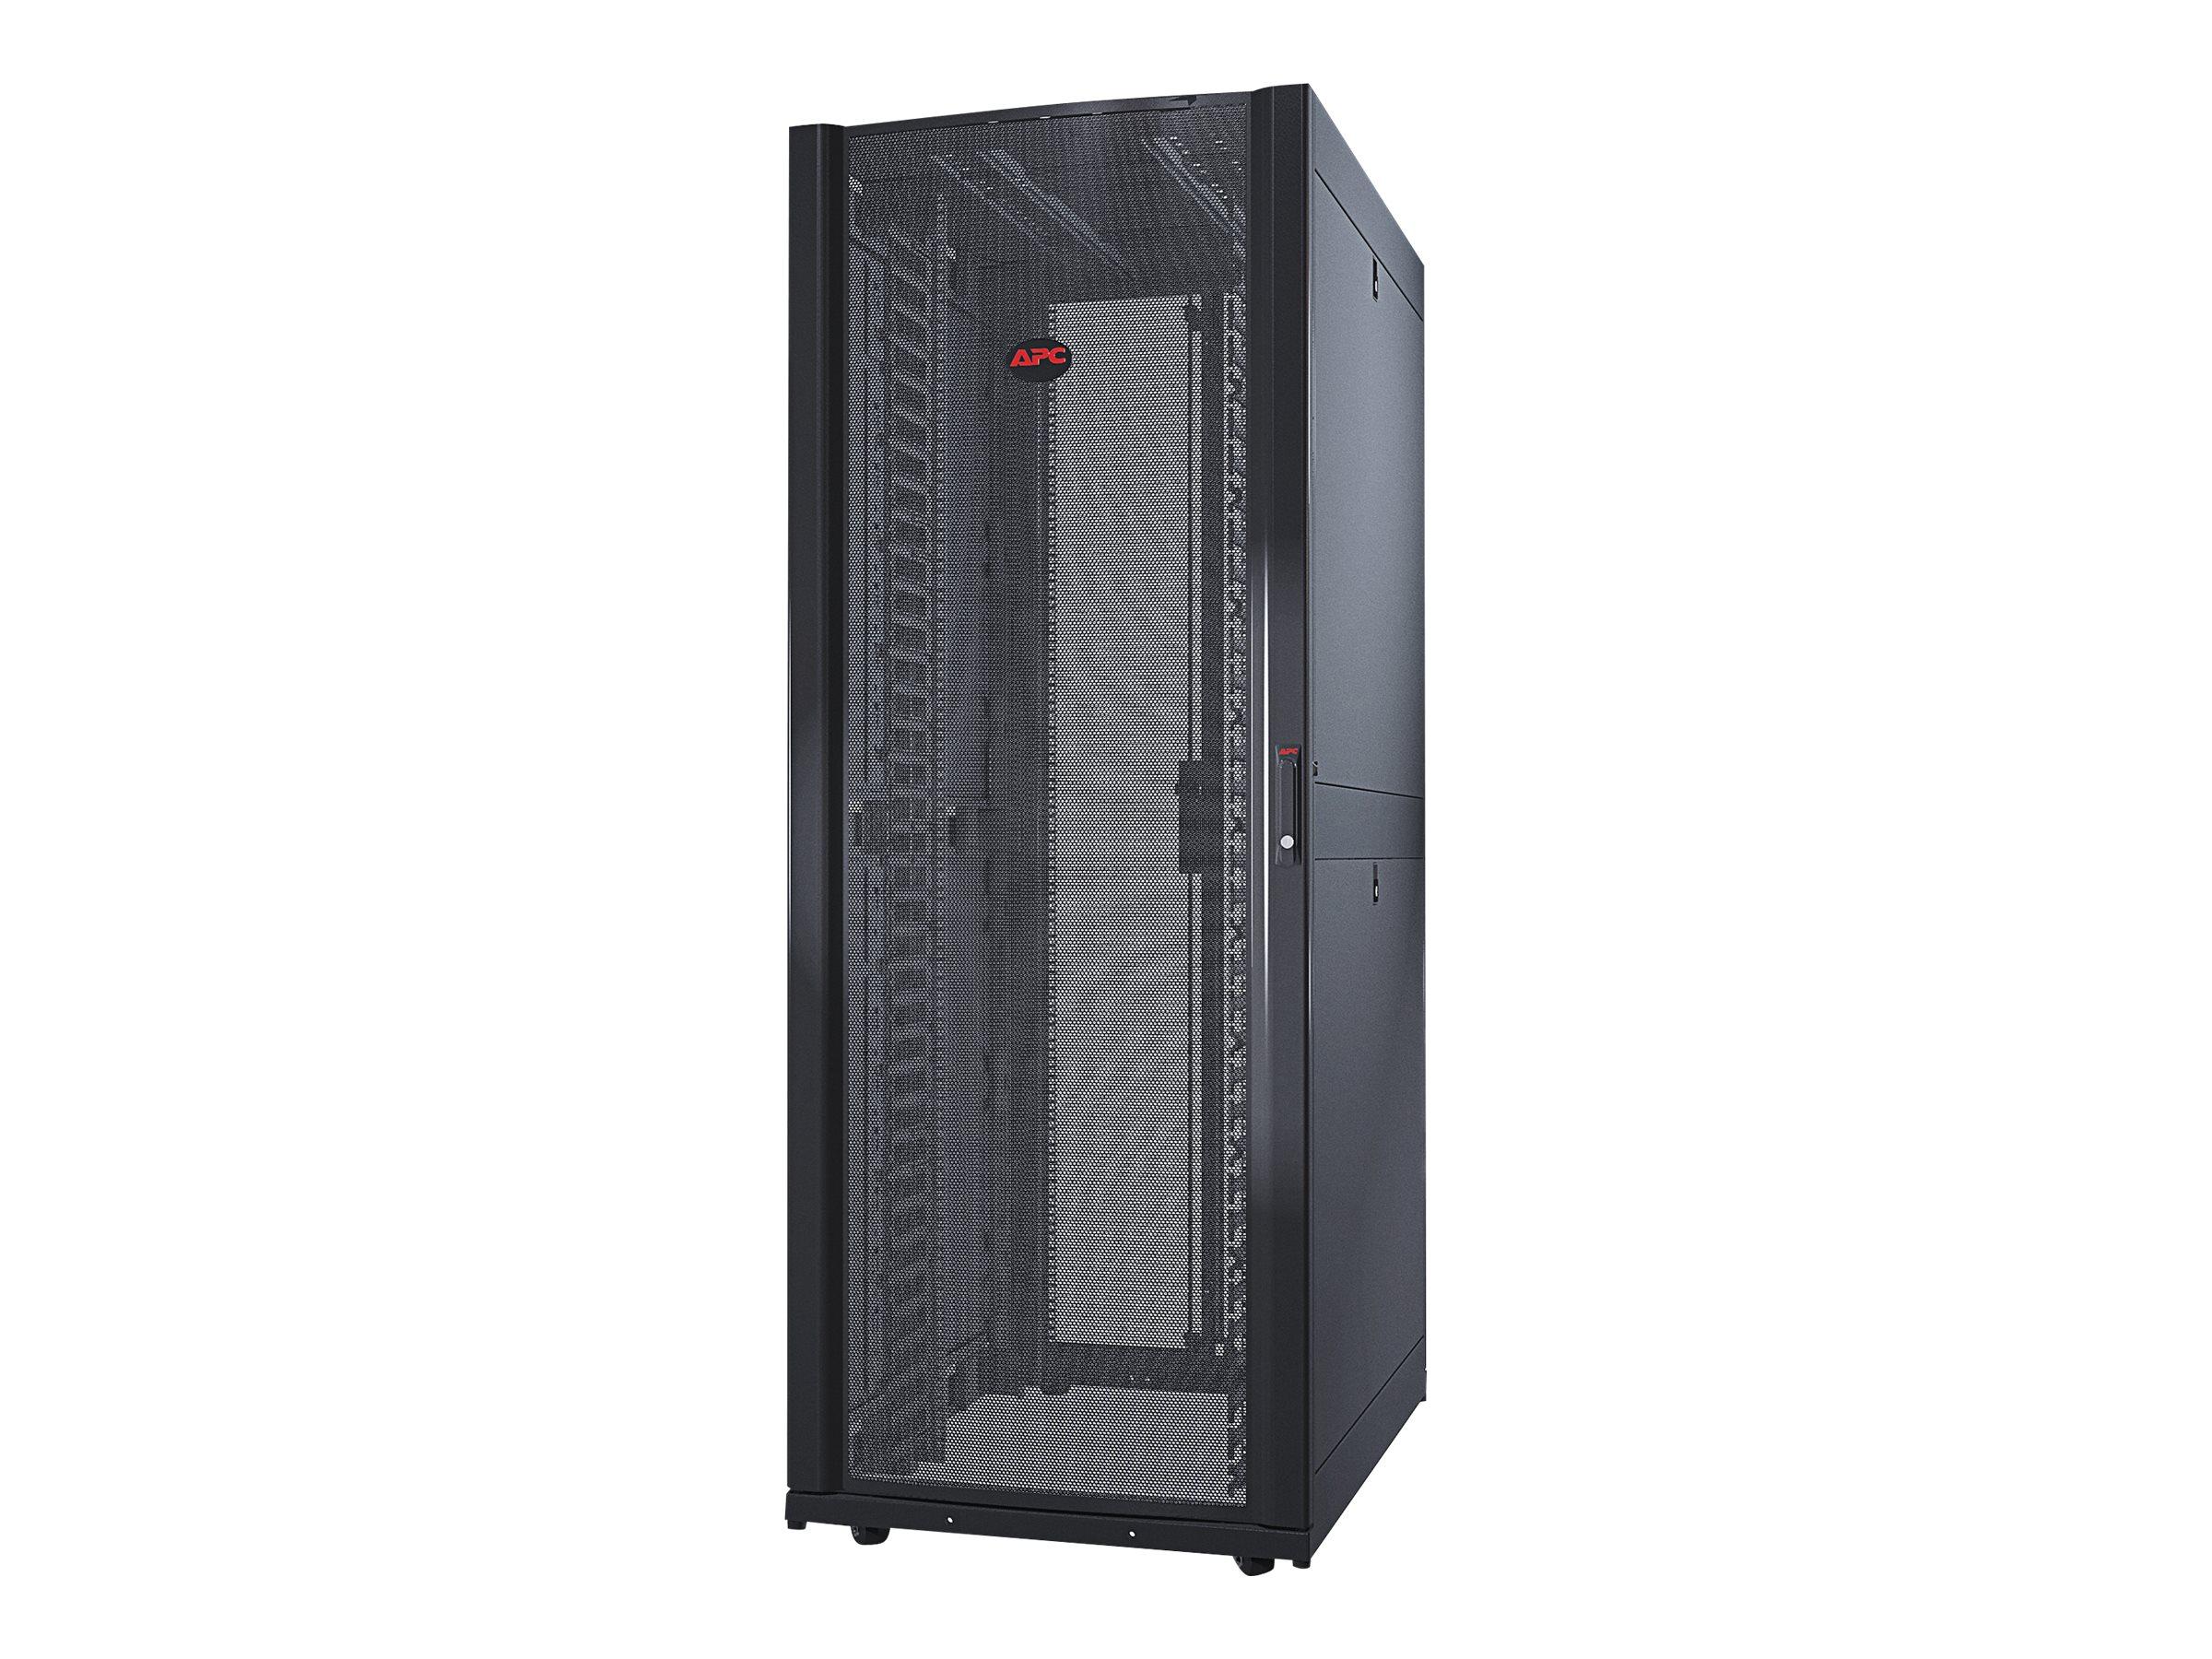 APC NetShelter SX Networking Enclosure with Sides - Schrank - Schwarz - 42HE - für P/N: SUA1000RMI2U, SUA2200RMXLI3U, SUA5000RMI